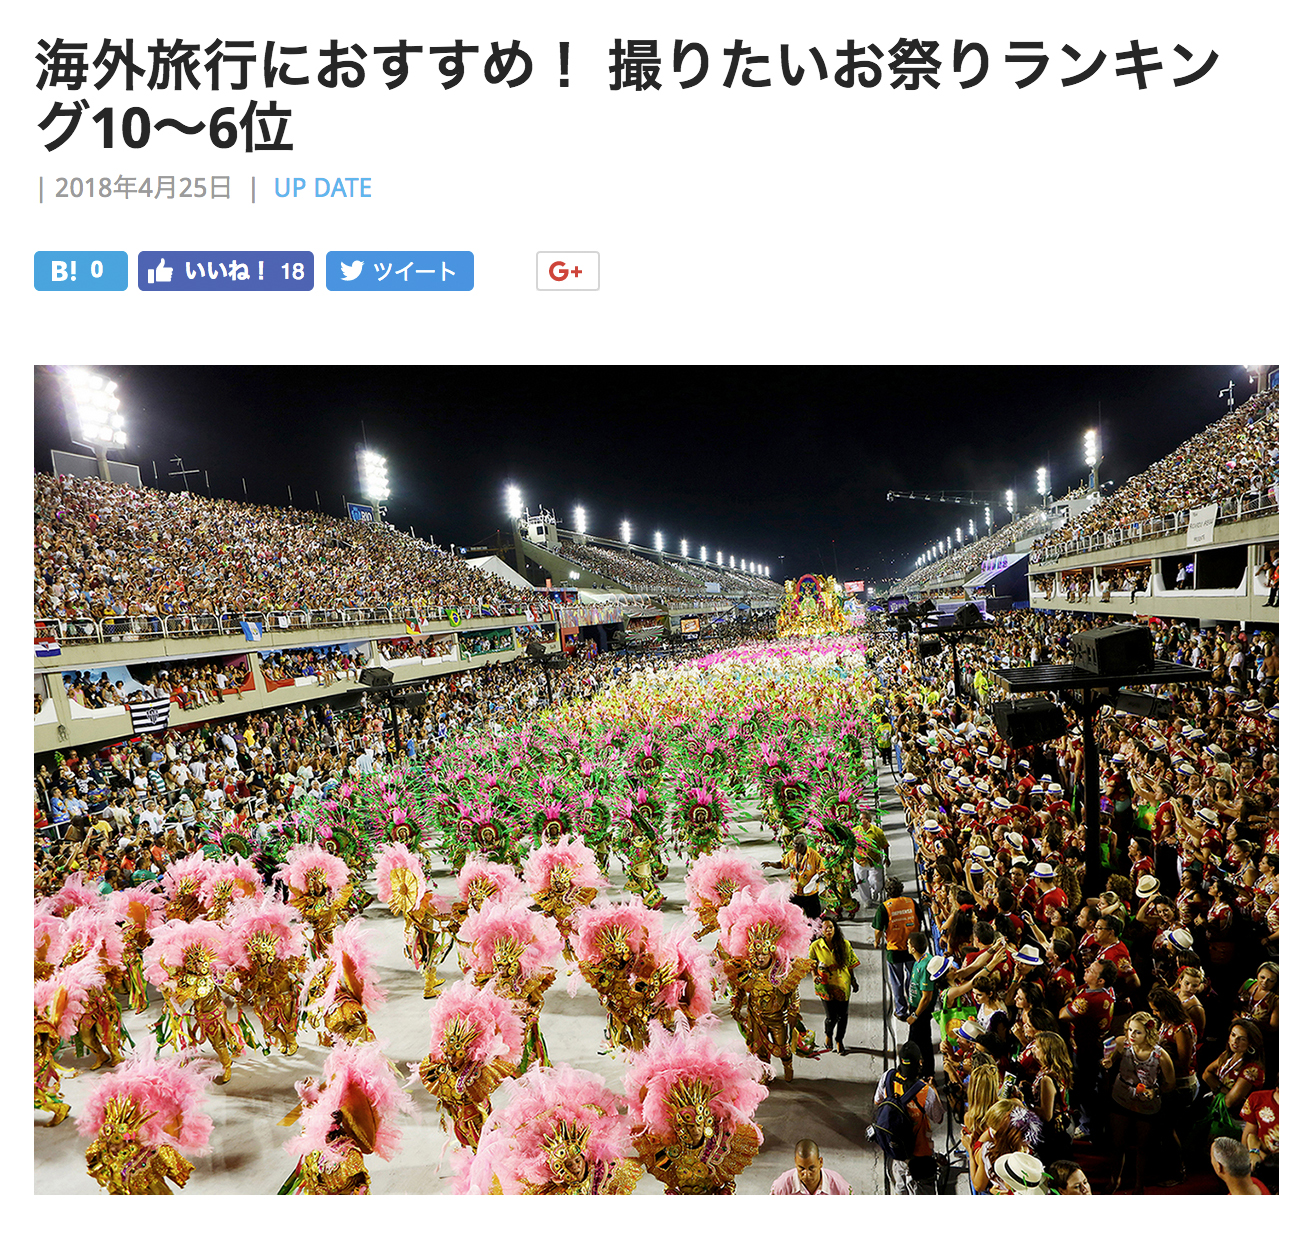 web_tearsheets_006.jpg